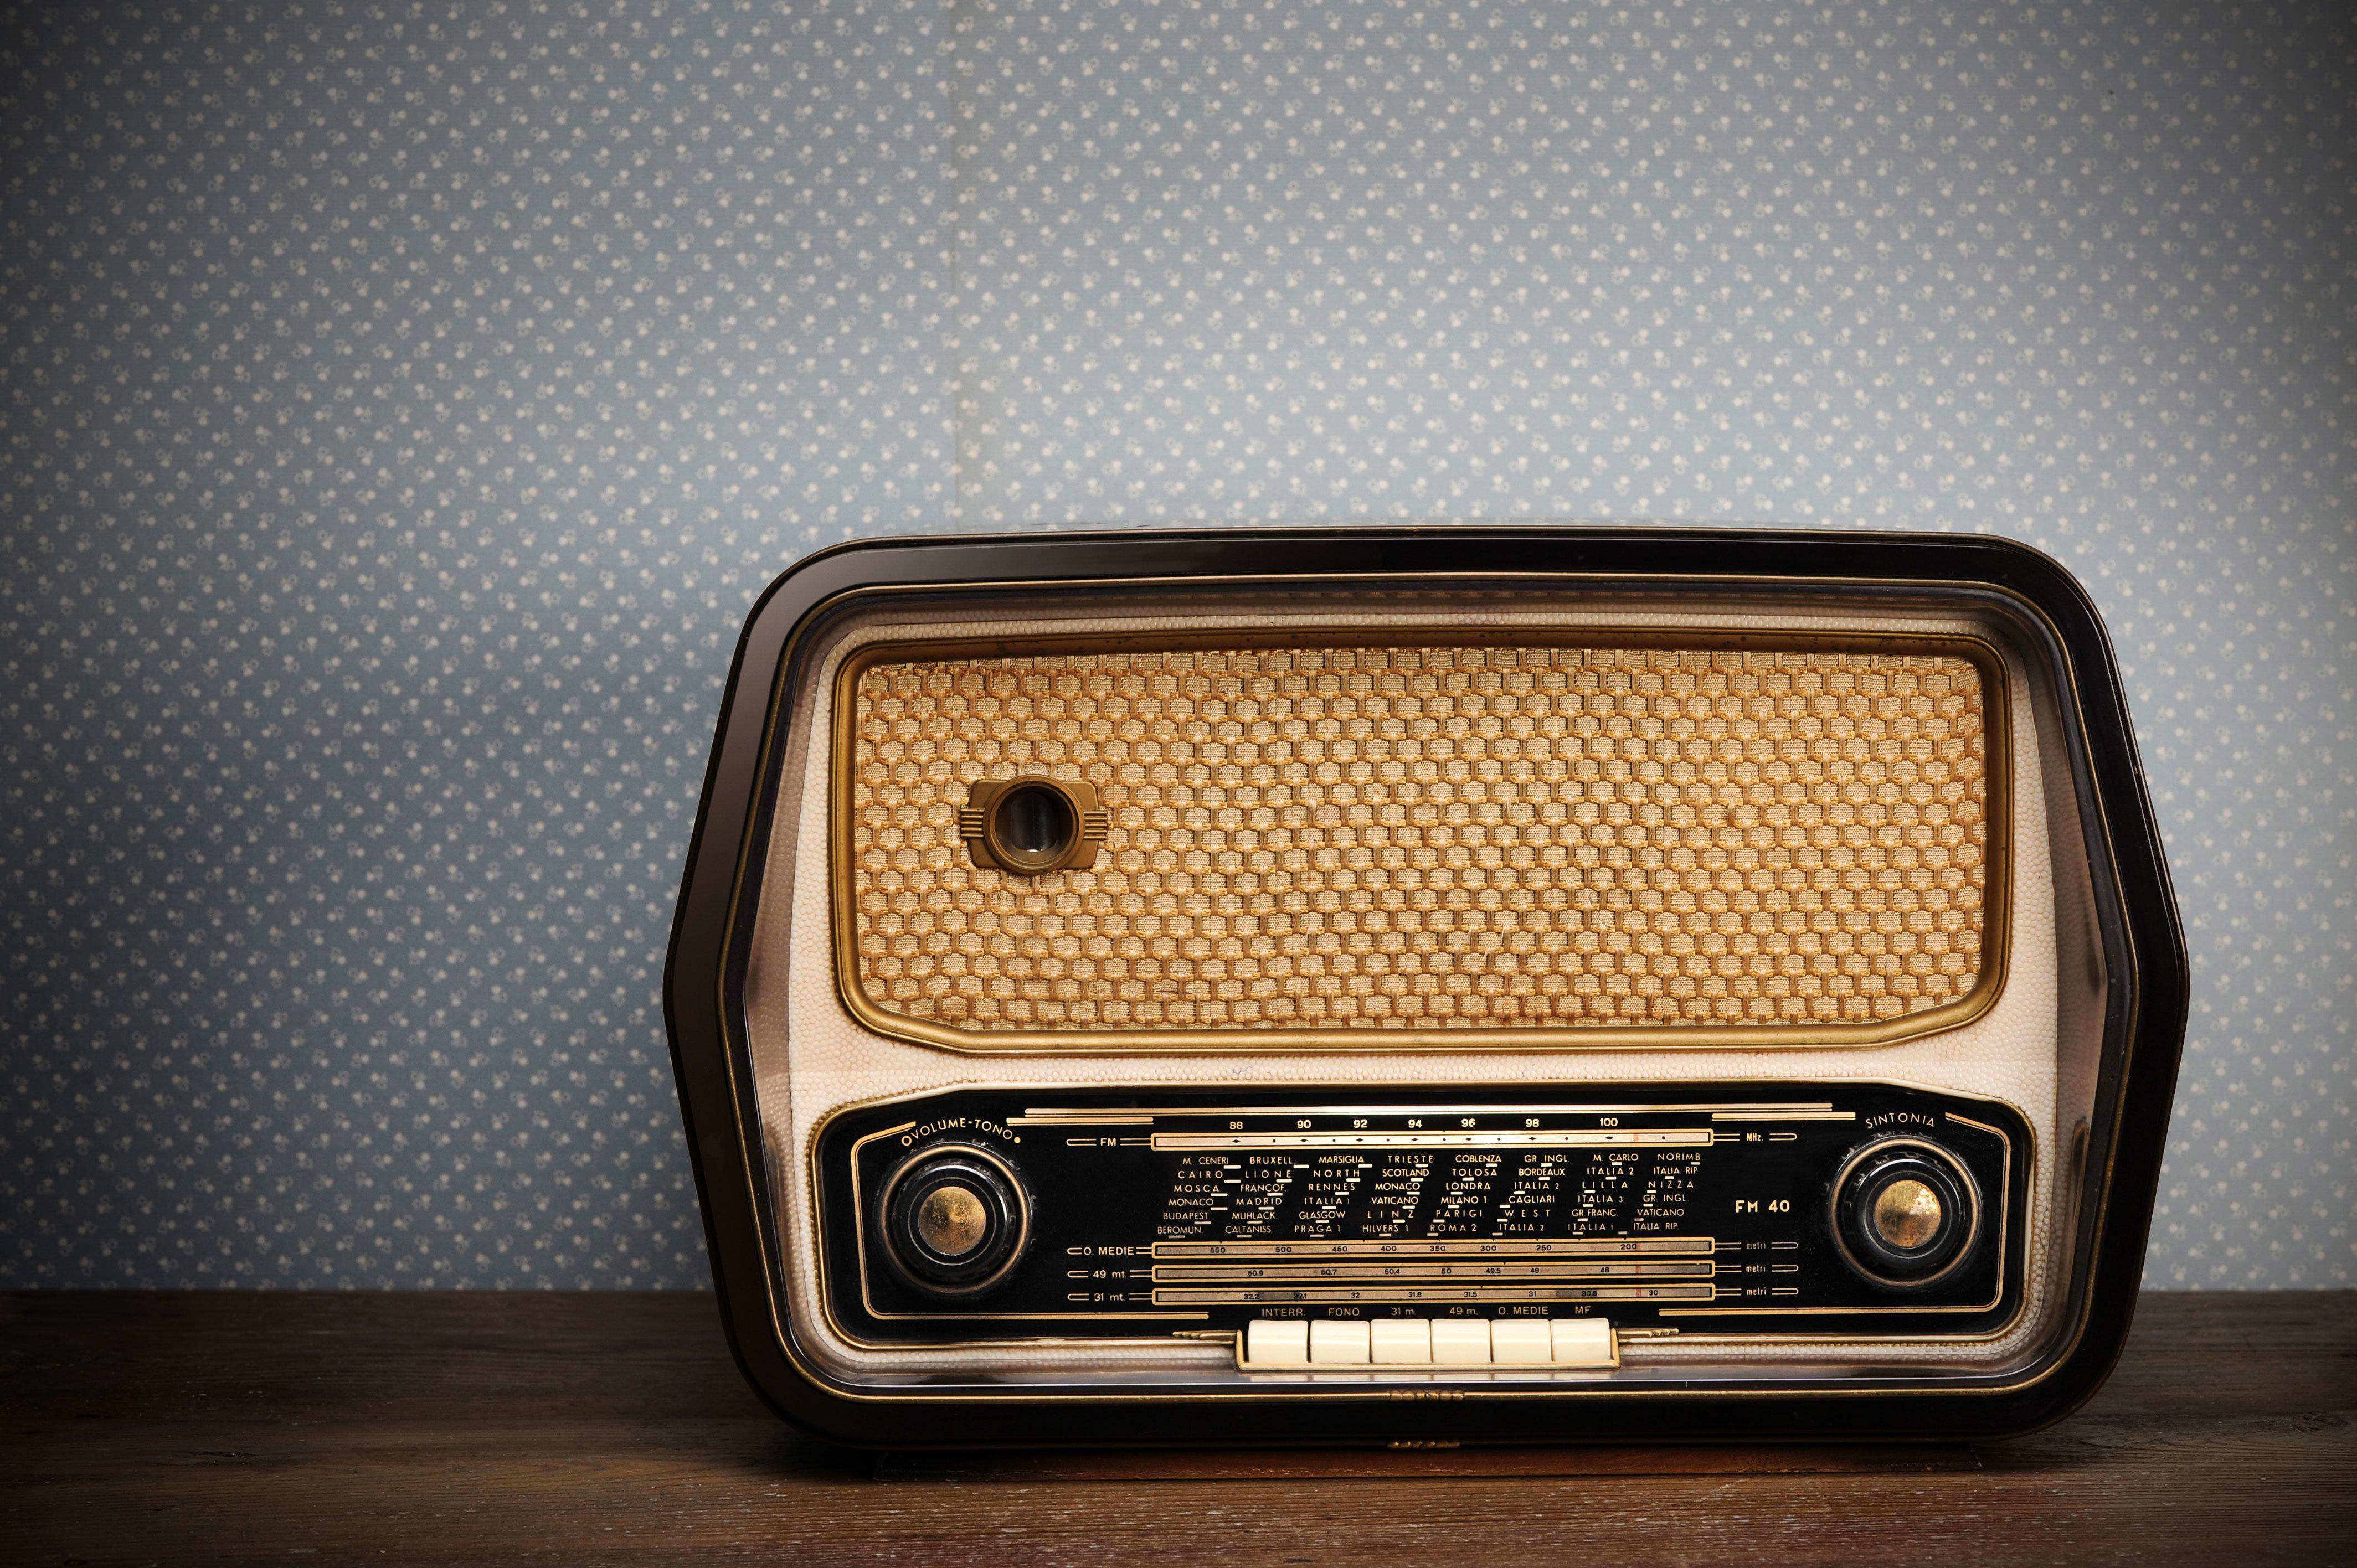 Black And Beige Radio Style Retro Old Radio 4k Wallpaper Hdwallpaper Desktop Vintage Radio Radio Evangelism